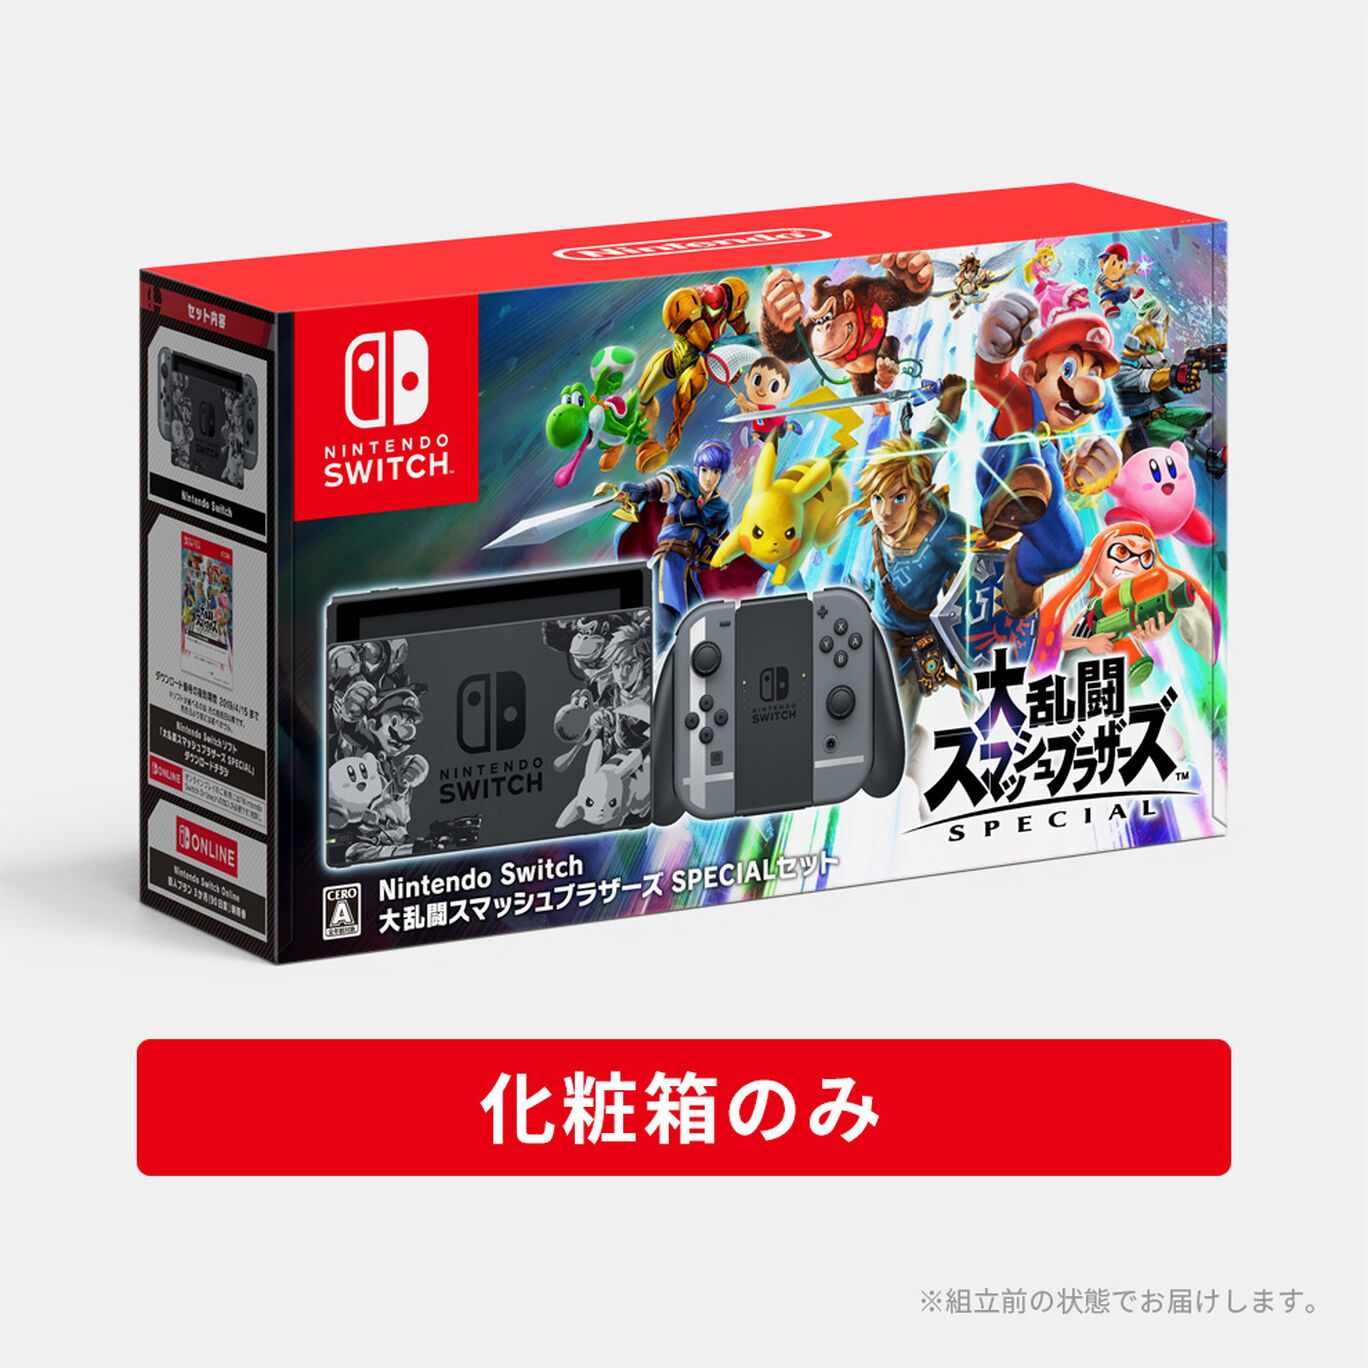 Nintendo Switch 大乱闘スマッシュブラザーズ SPECIALセット 化粧箱